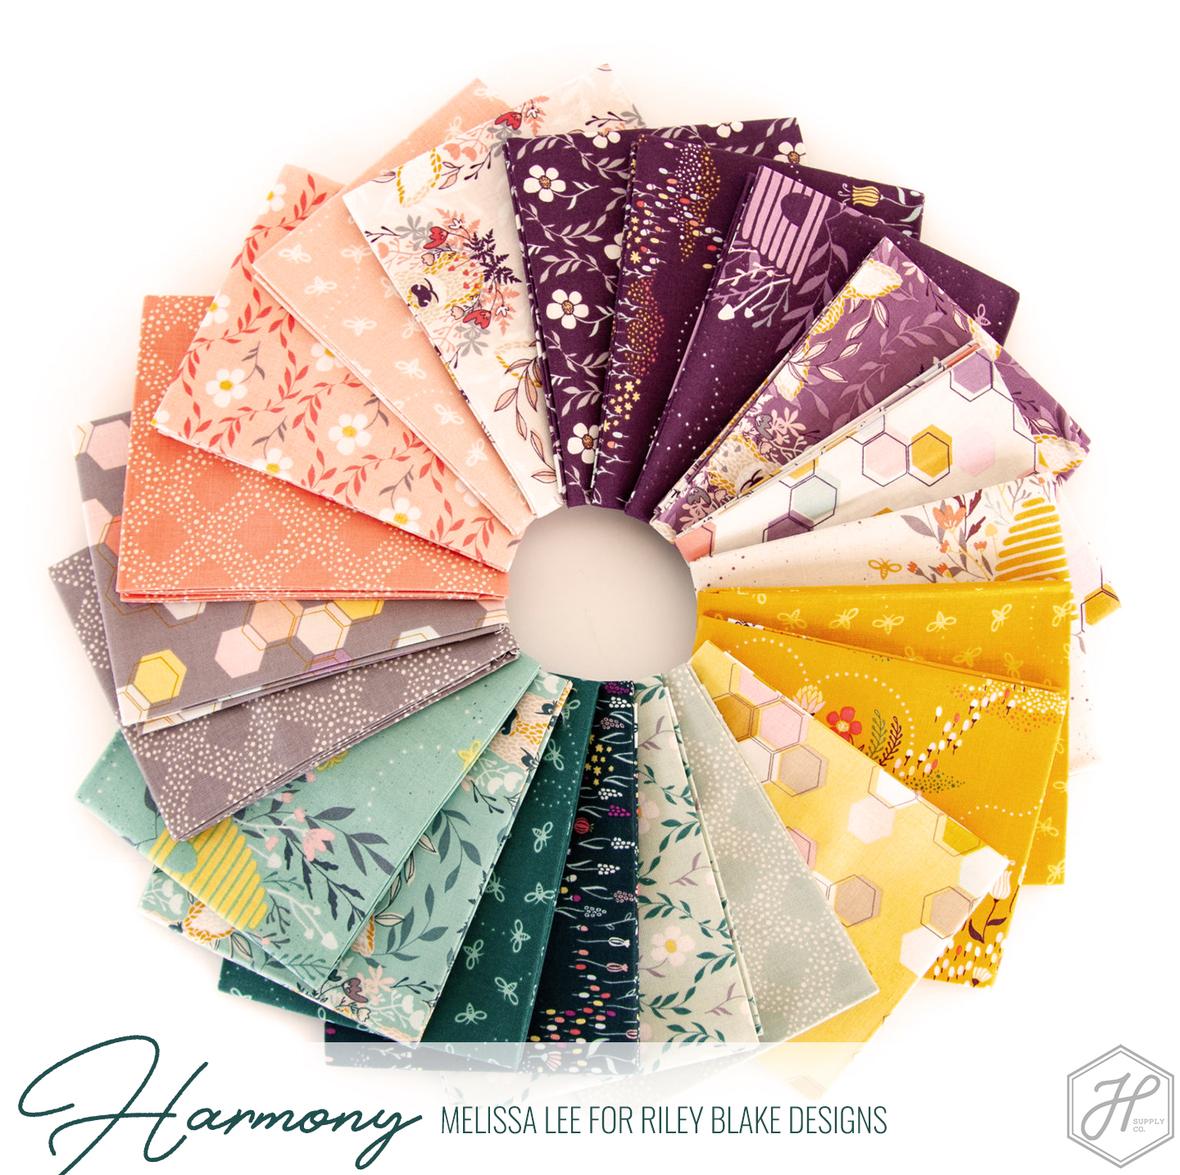 Harmony fabric Melissa Lee for Riley Blake Designs